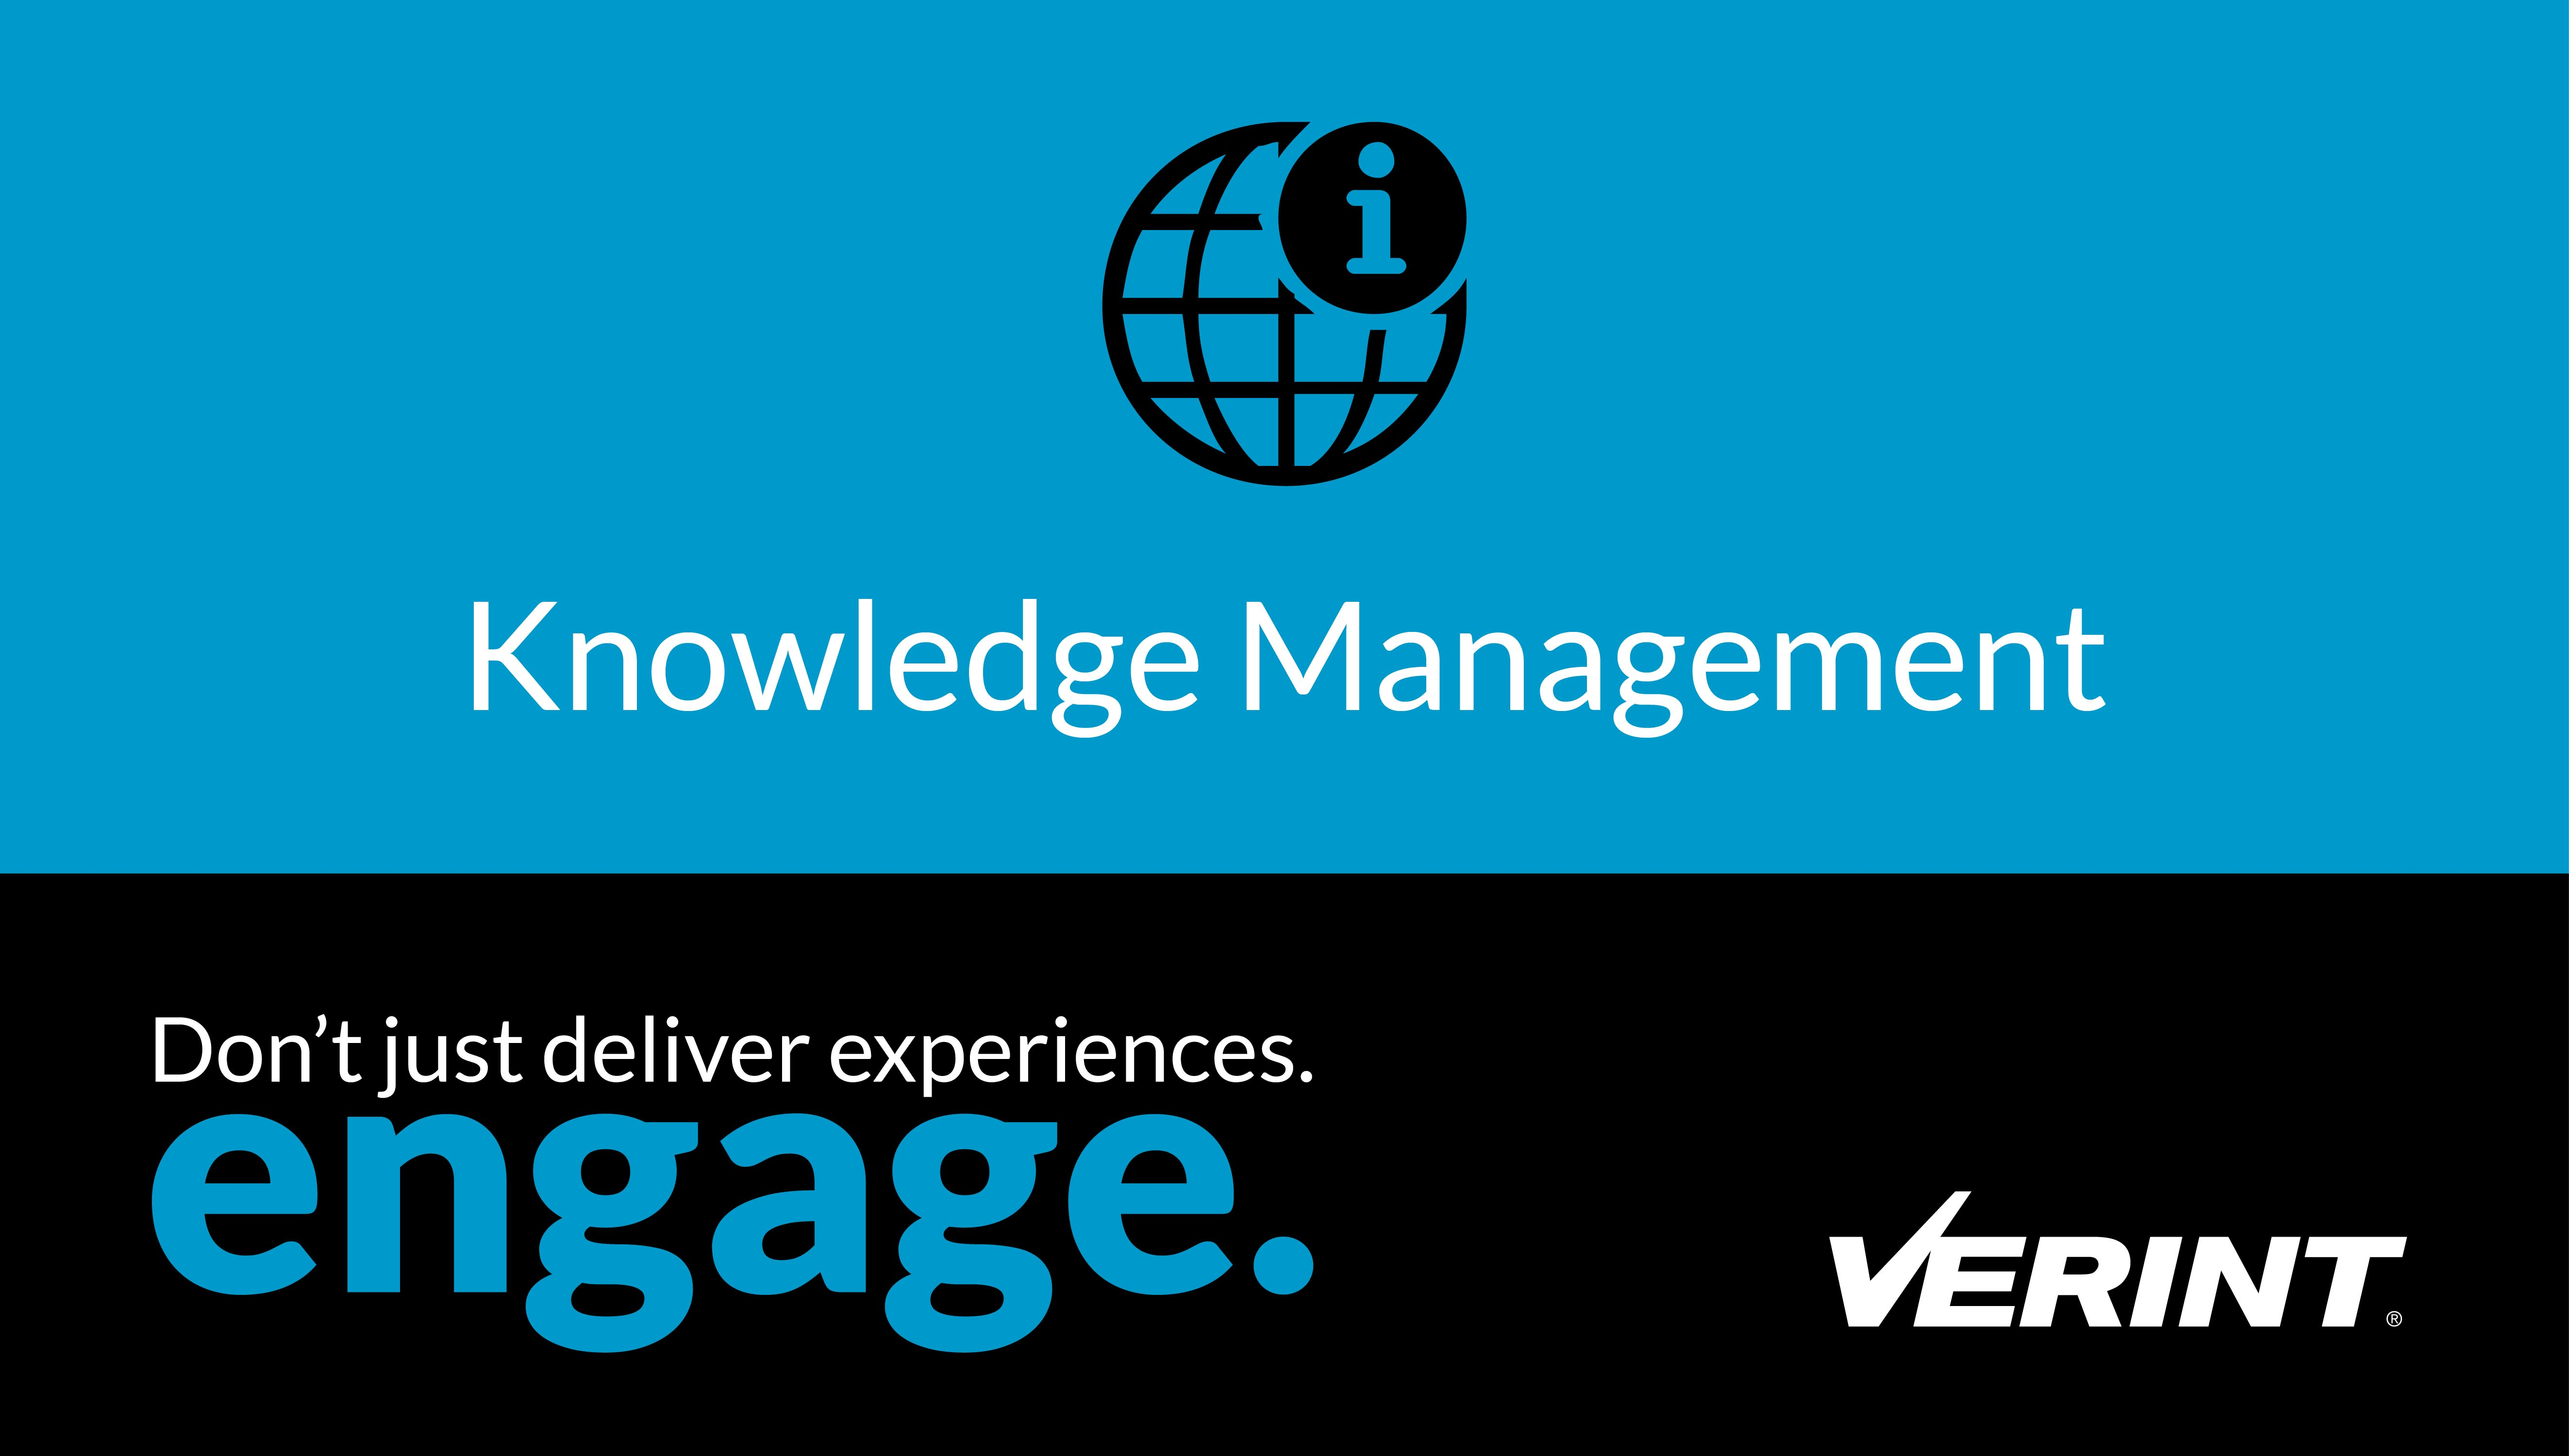 Verint Knowledge Management